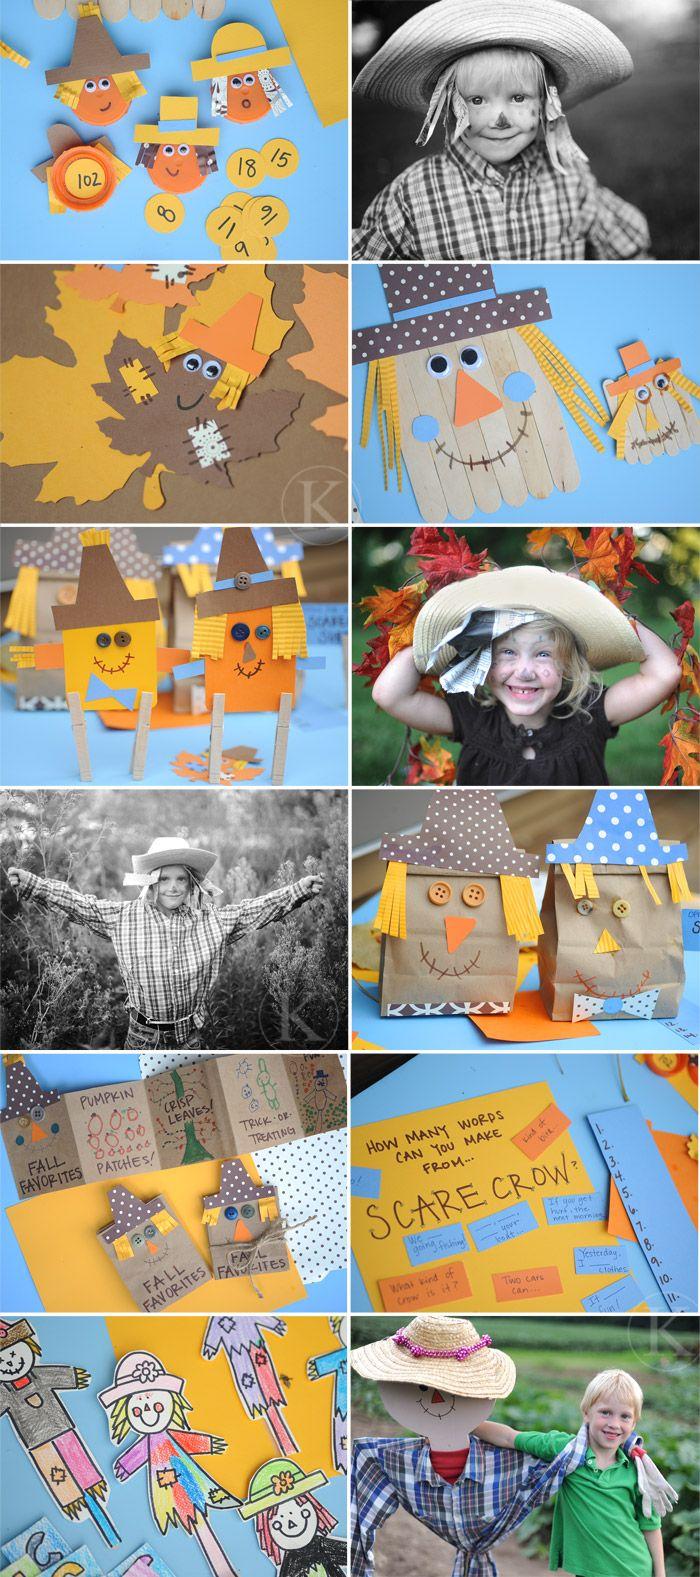 Thanksgiving crafts w/the kiddo